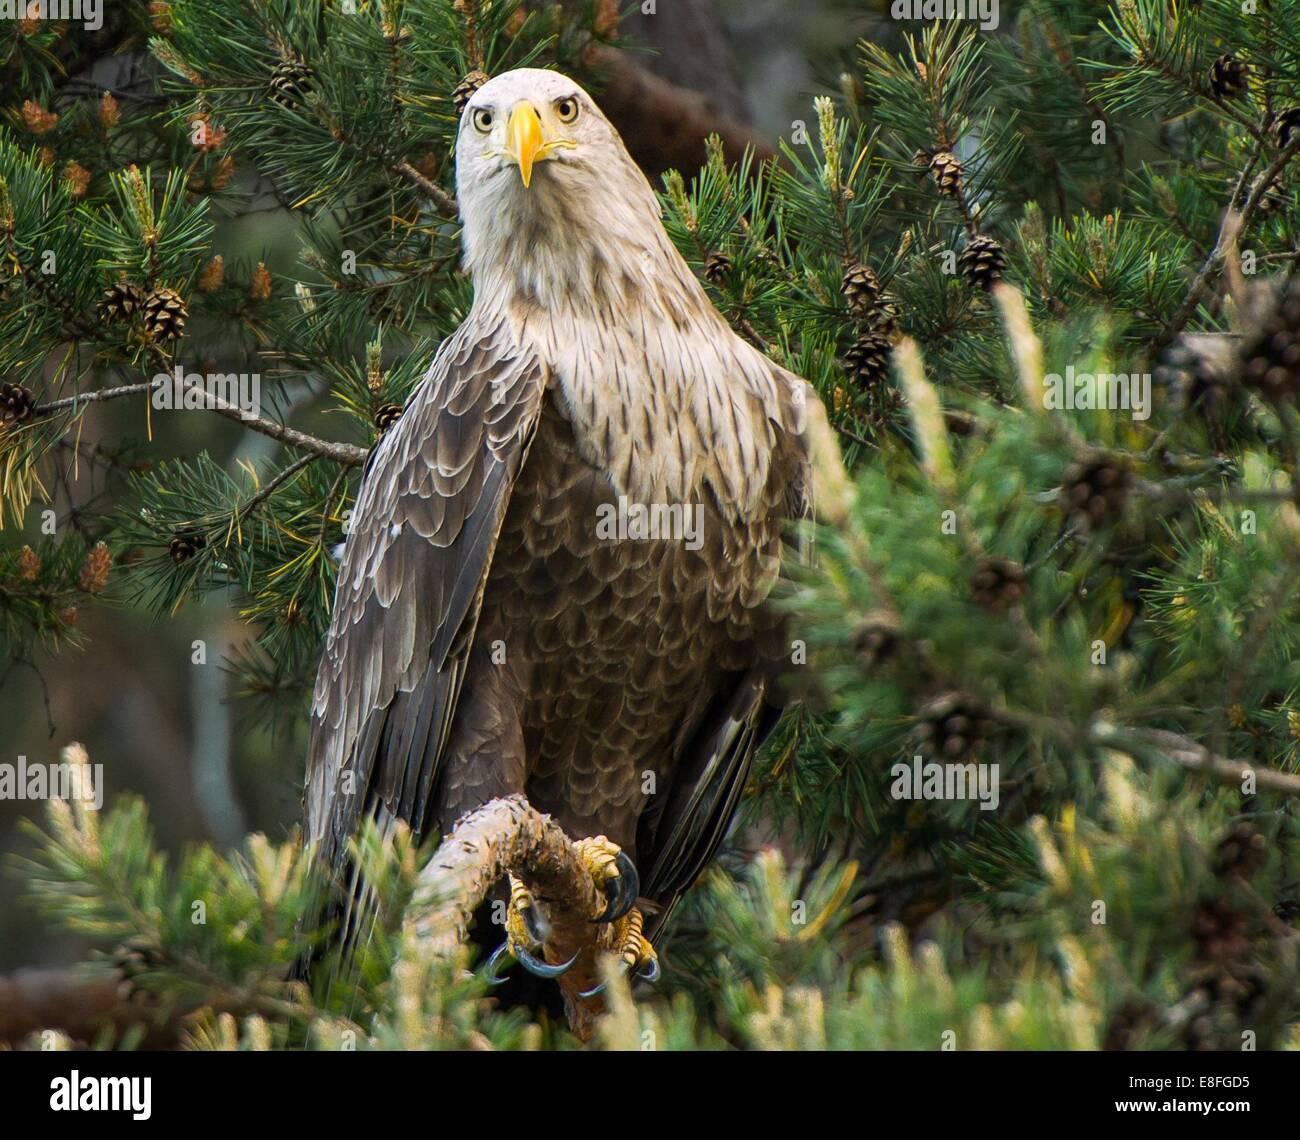 Bird of prey - Stock Image